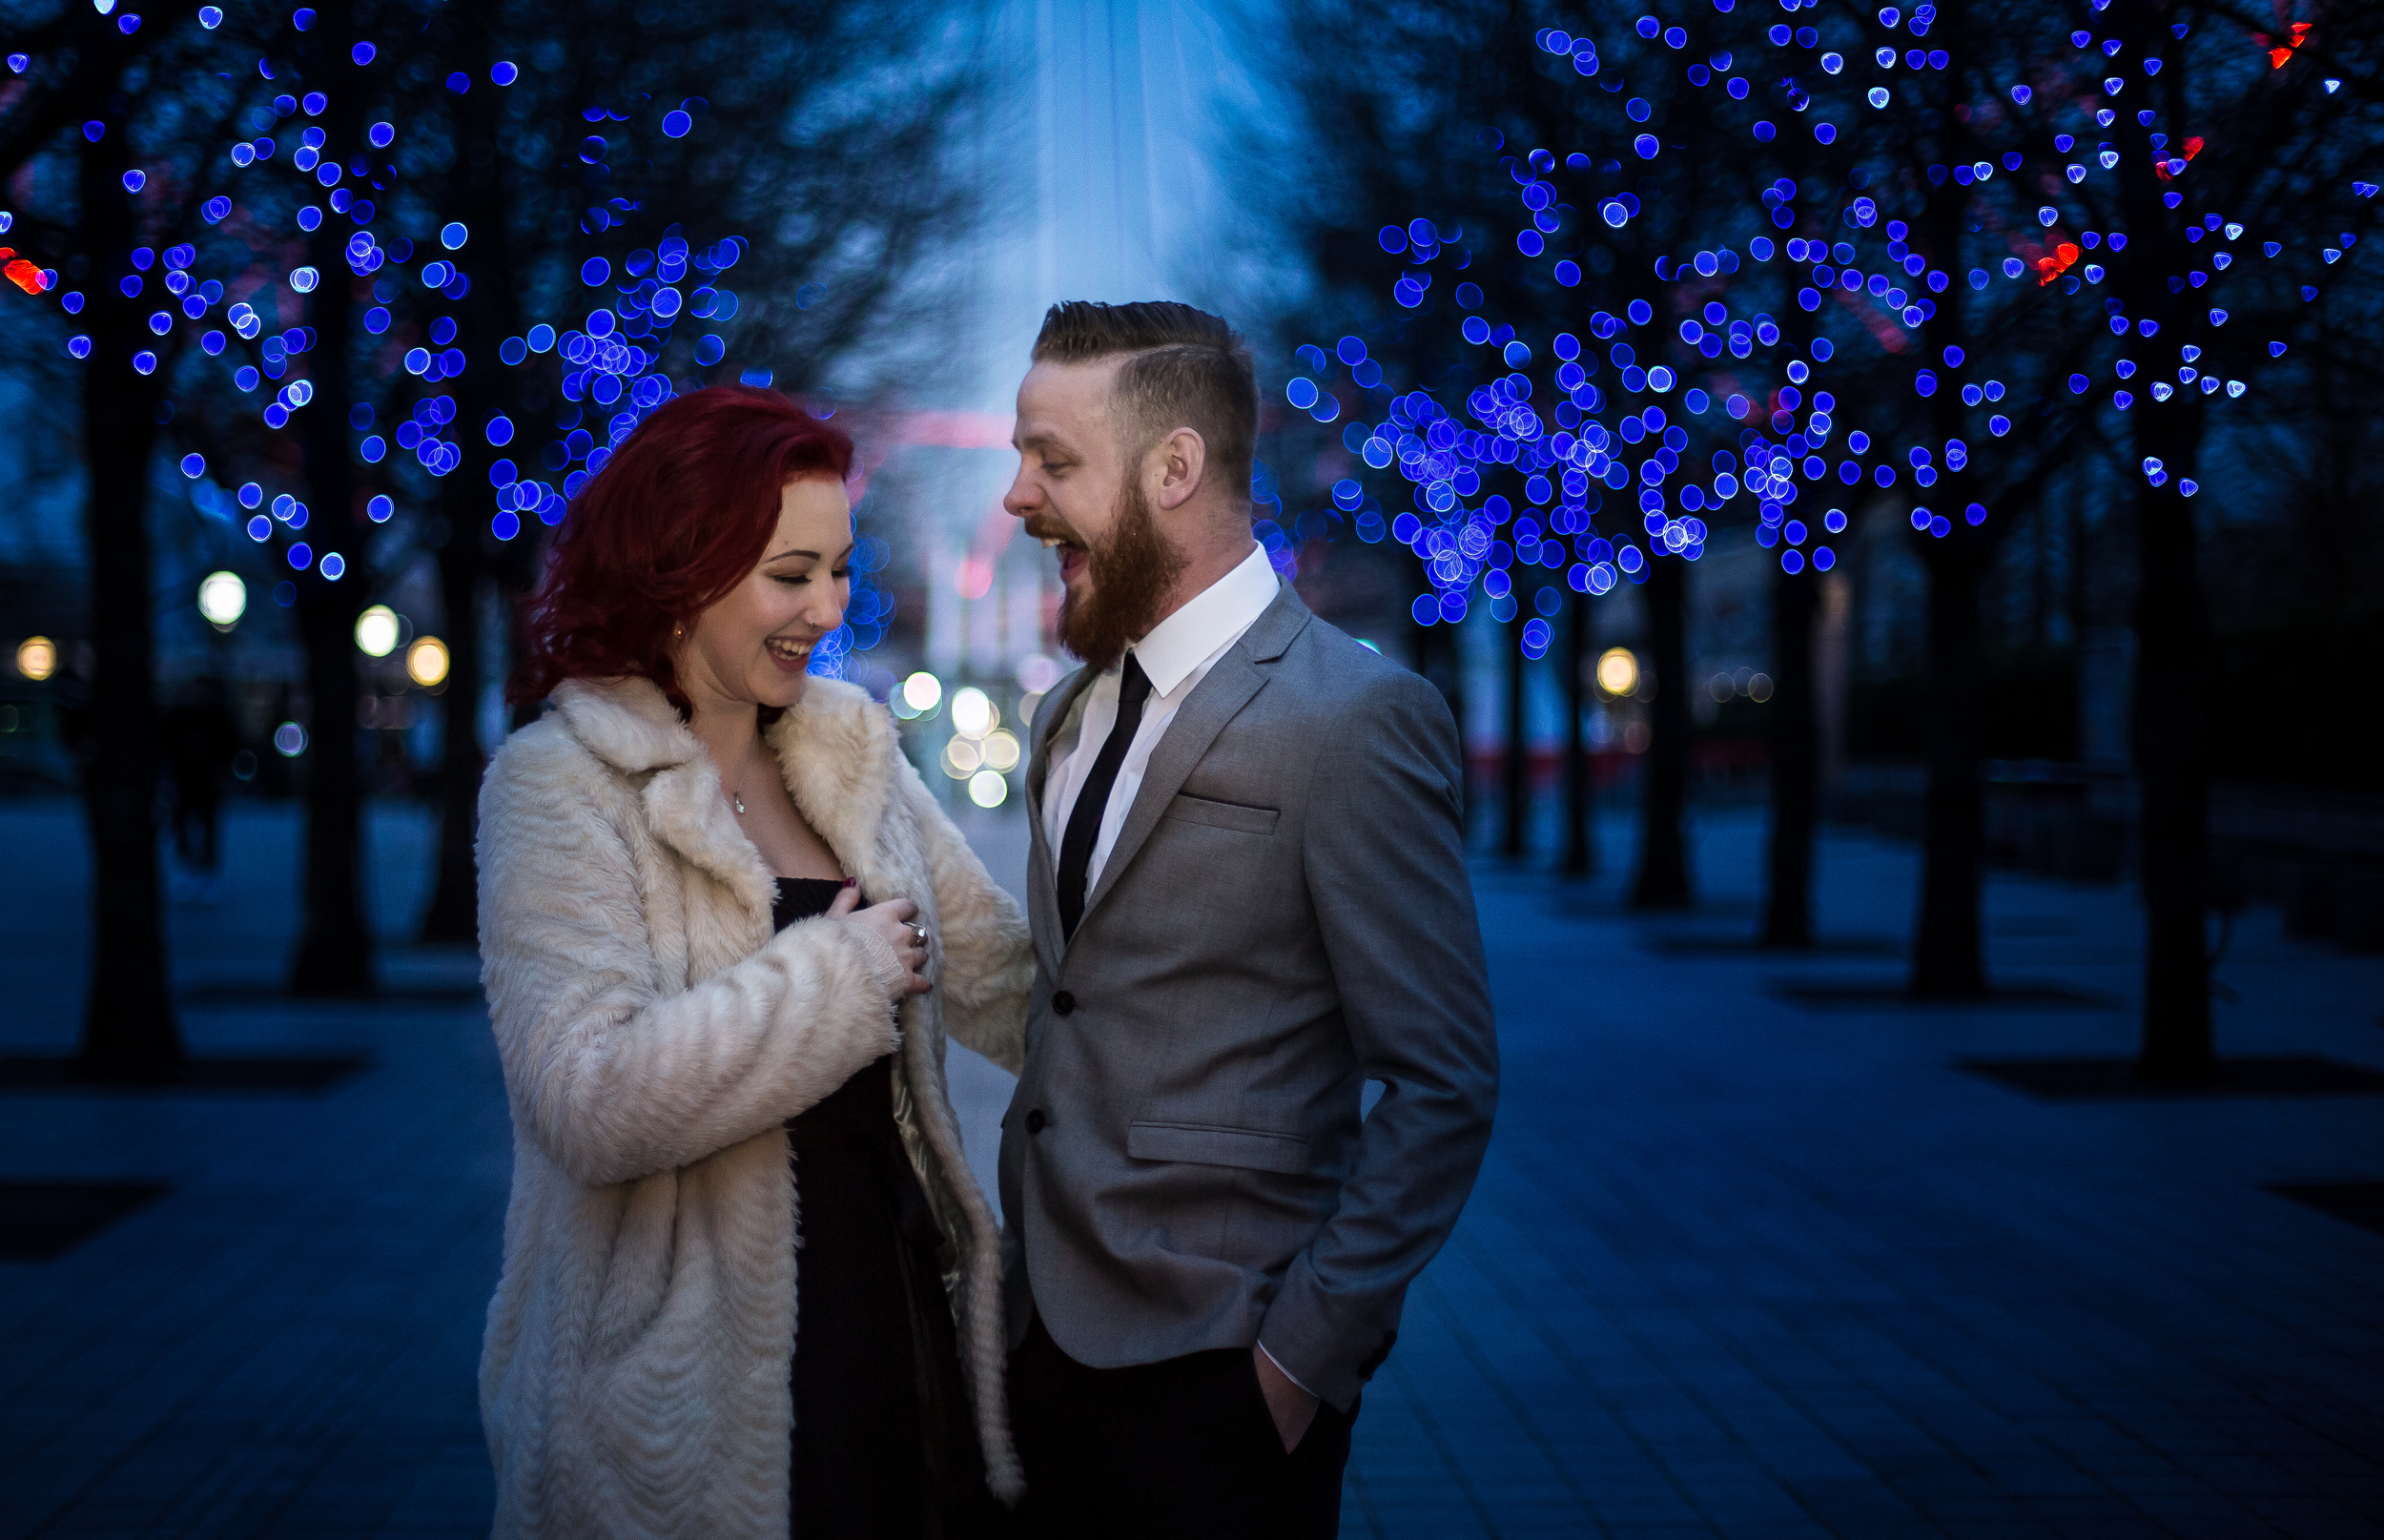 london-eye-engagement-london-uk-destination-wedding-photography-Adam-Rowley